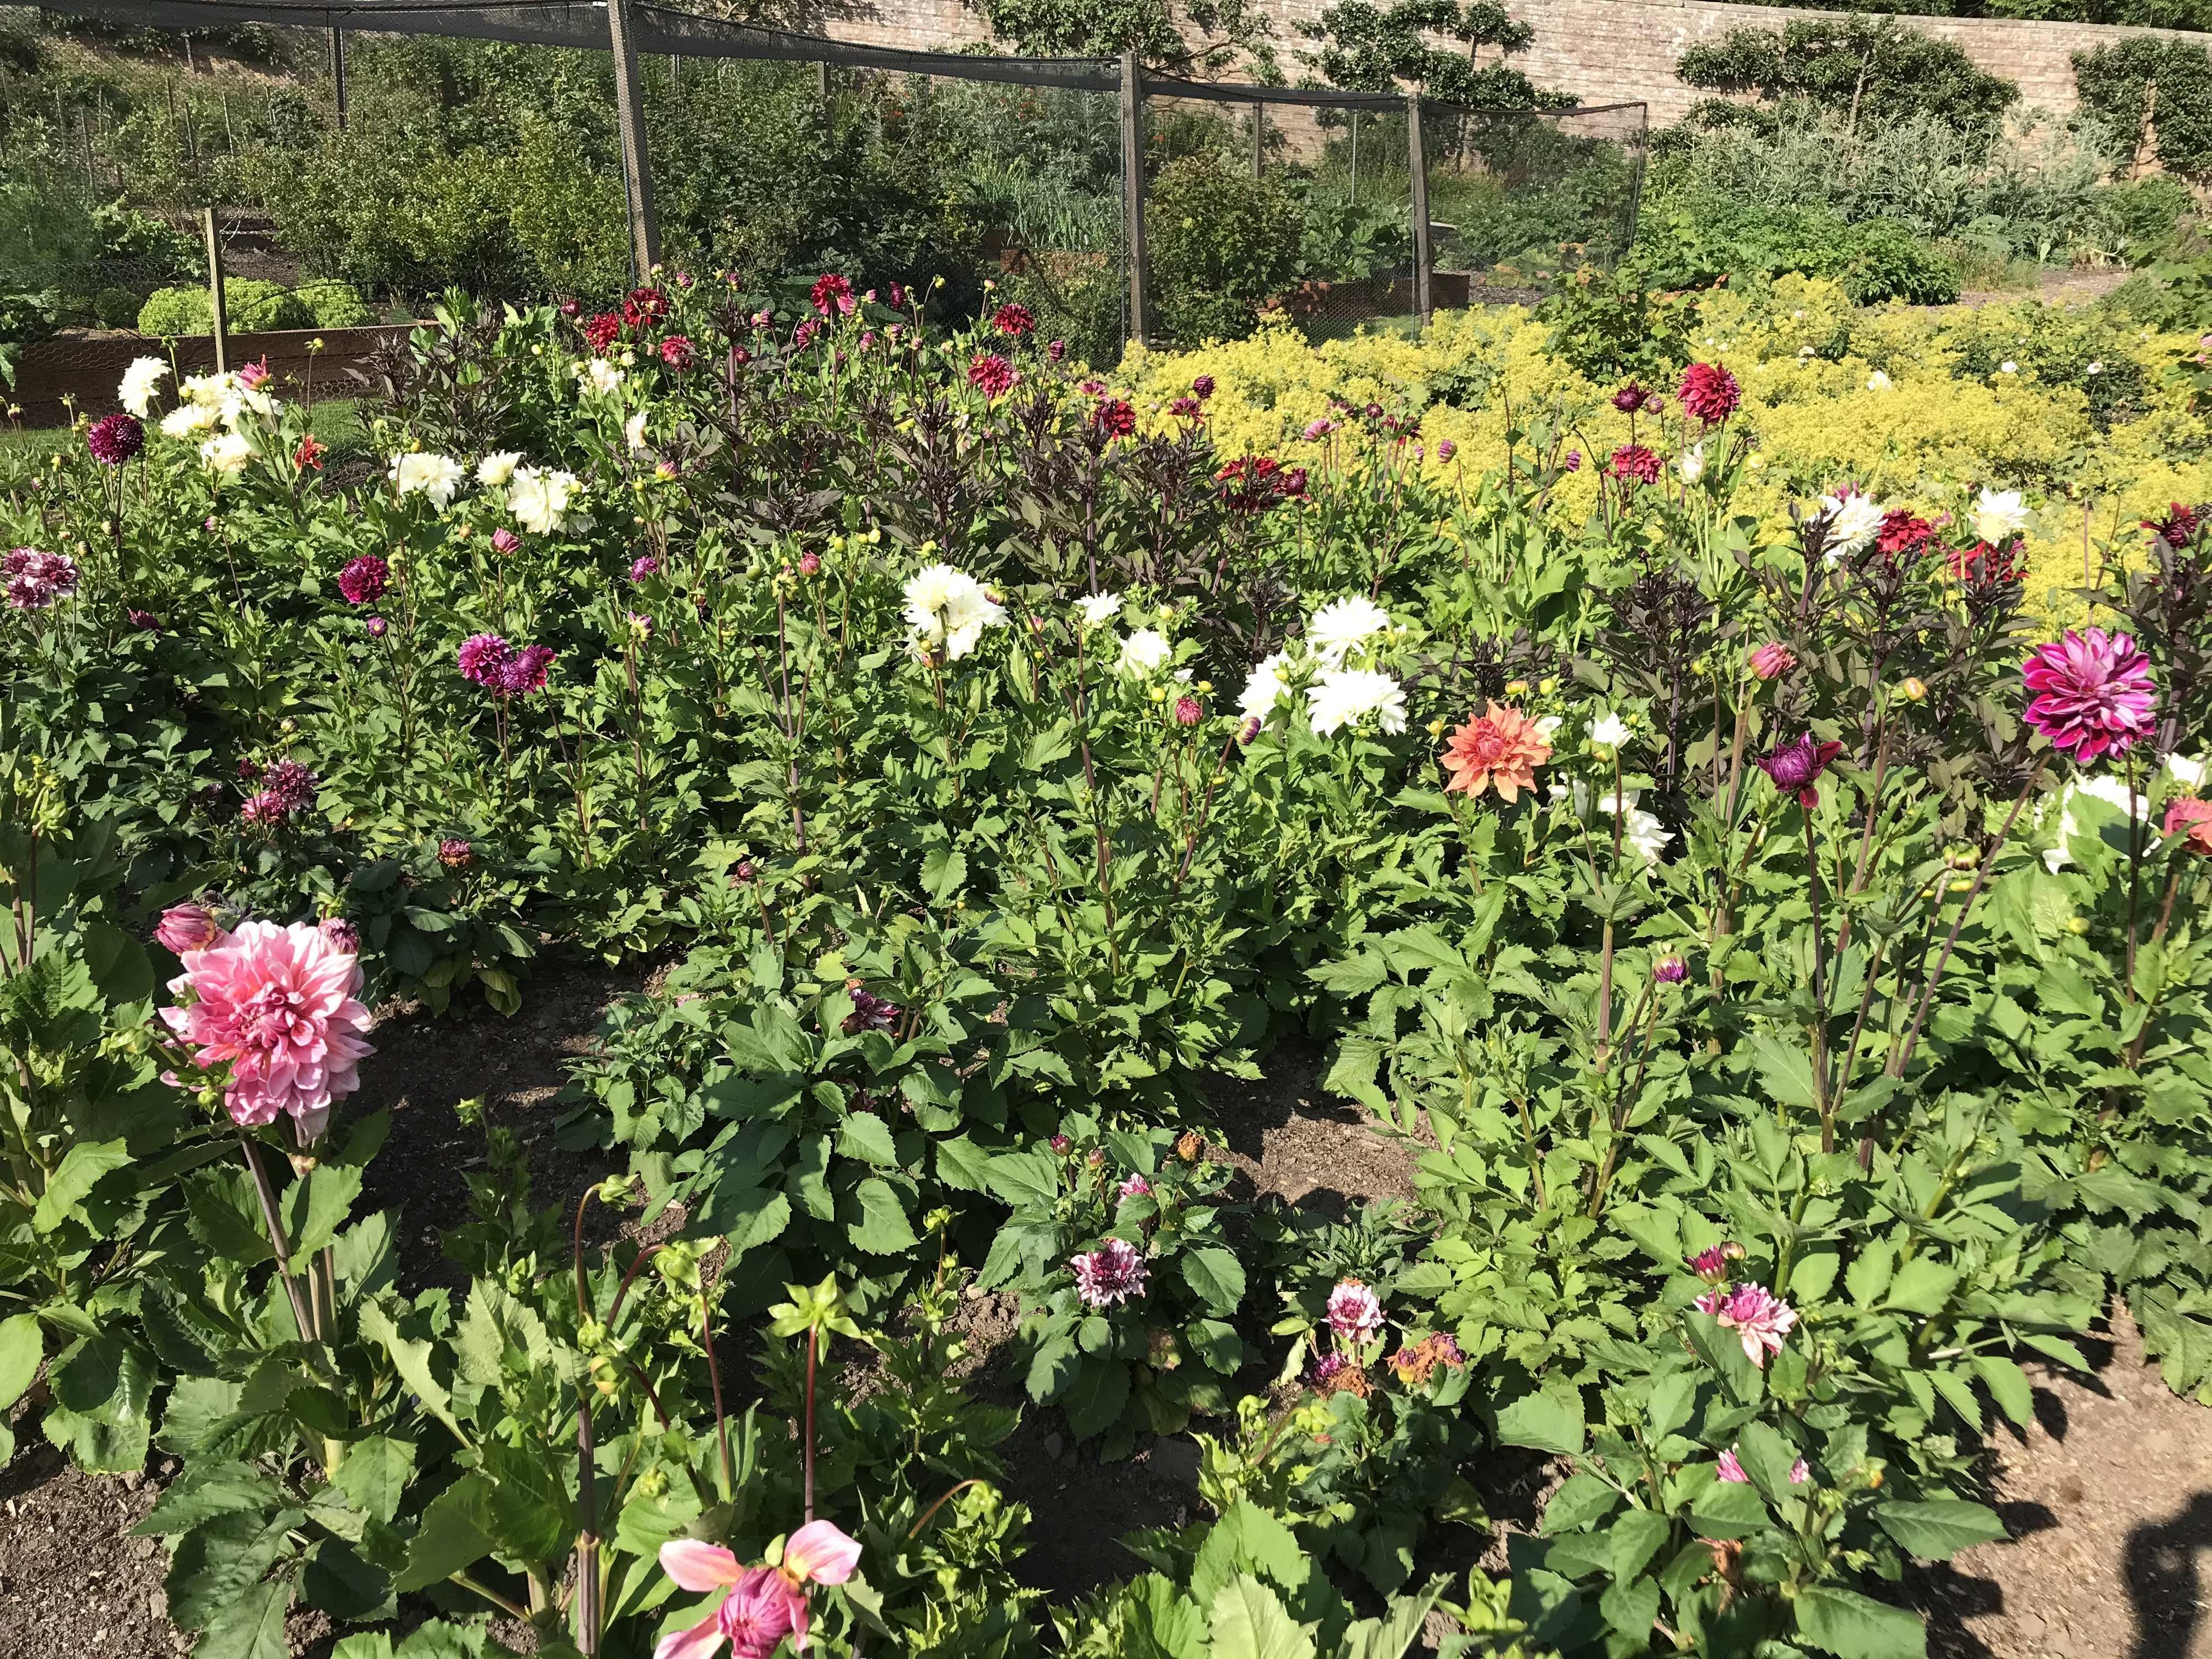 Teasses, Walled Garden, Dahlia, Teasses Estate